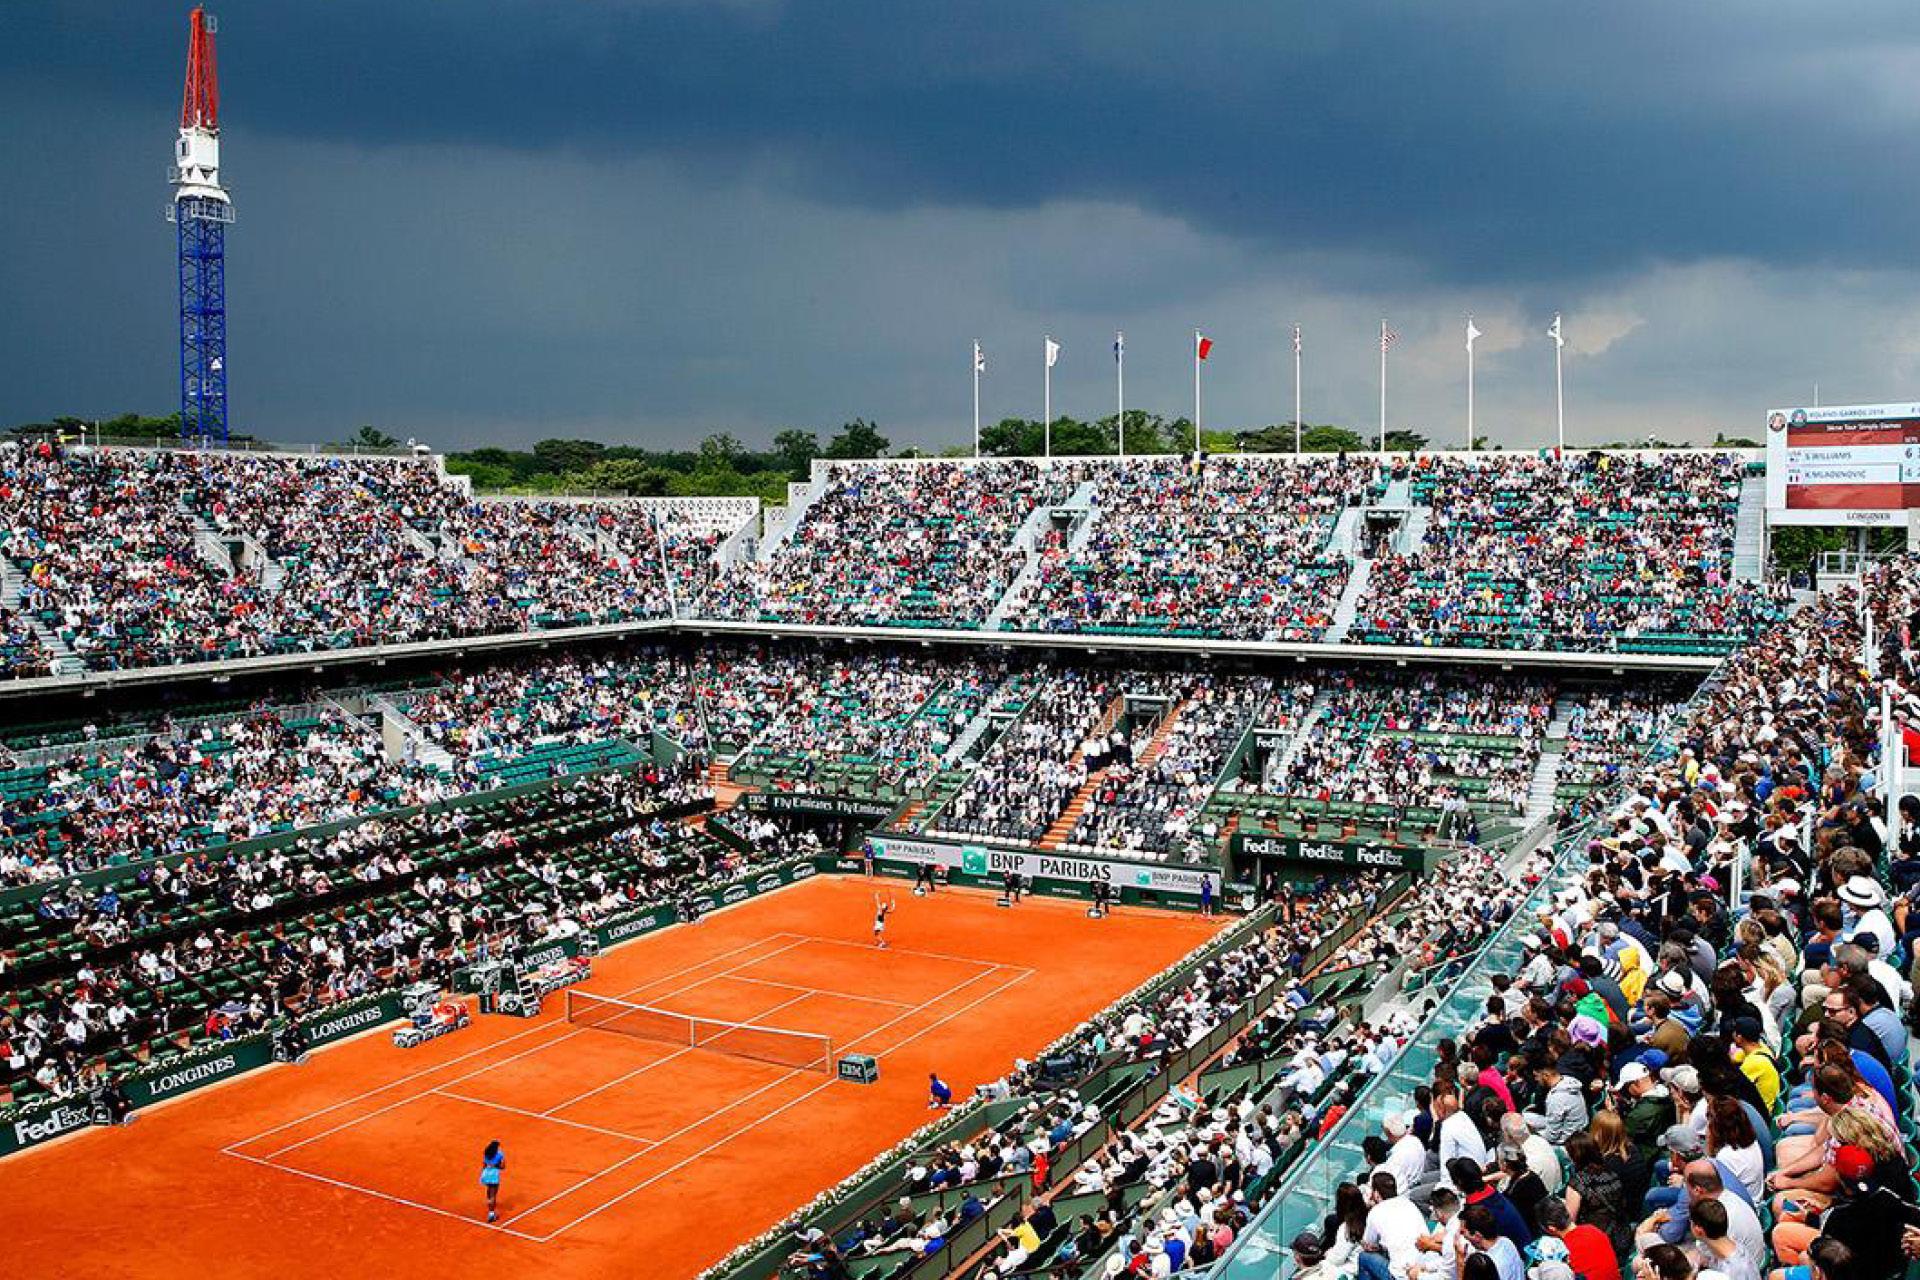 Roland Garros Images-6.jpg